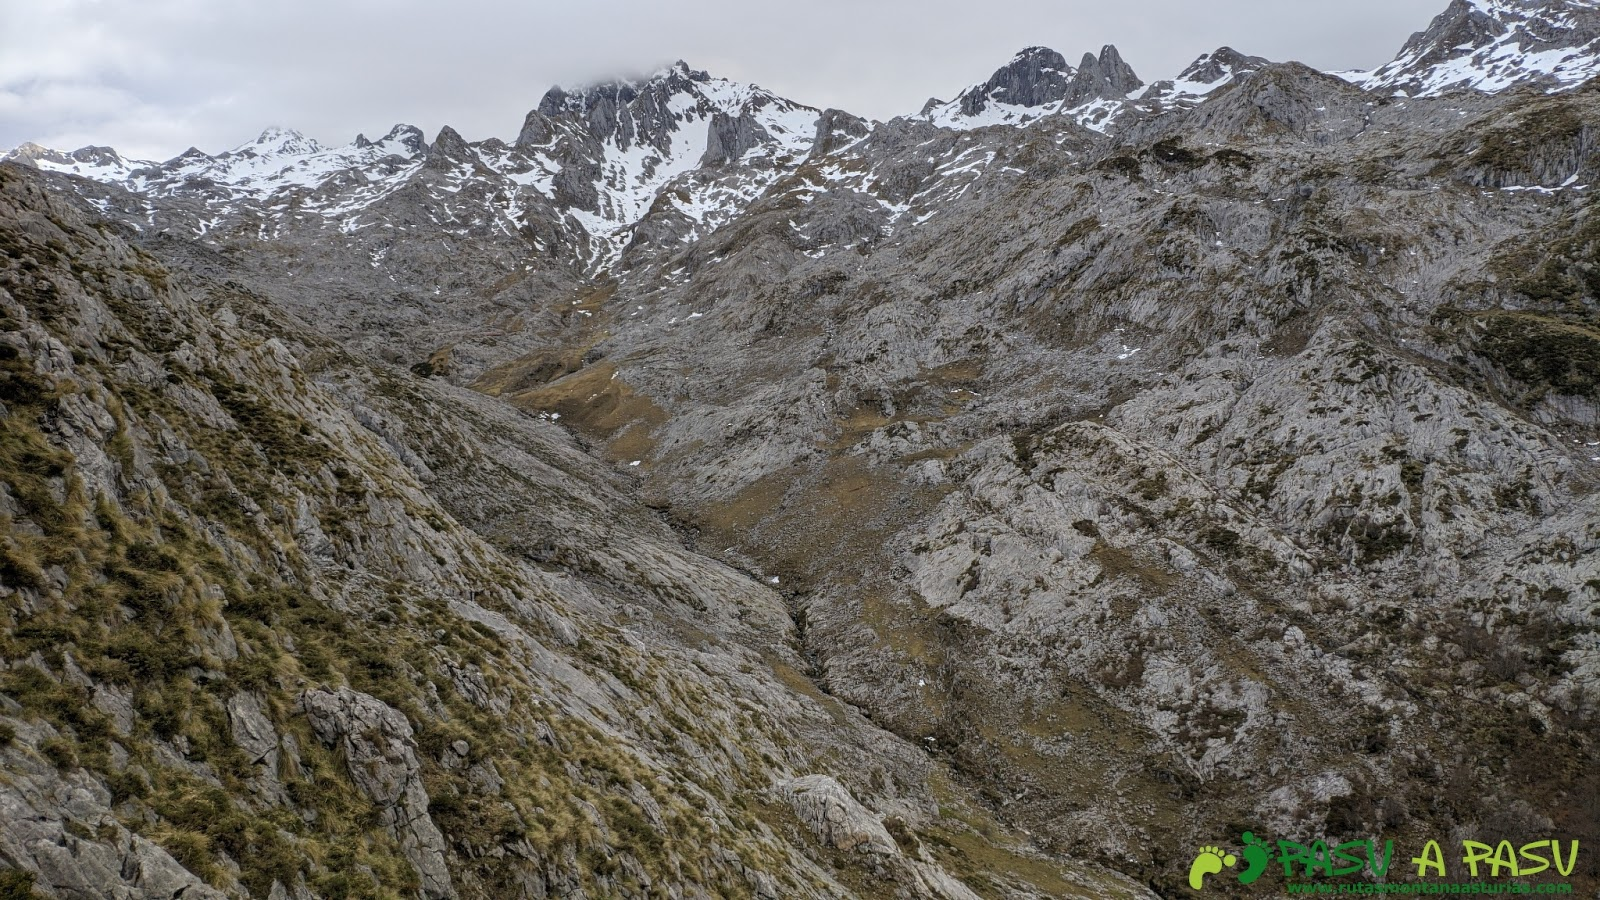 Al río Junjumia, en Picos de Europa Ruta-alto-gurbi%25C3%25B1ales-camin-de-la-madera-_20200209_160423